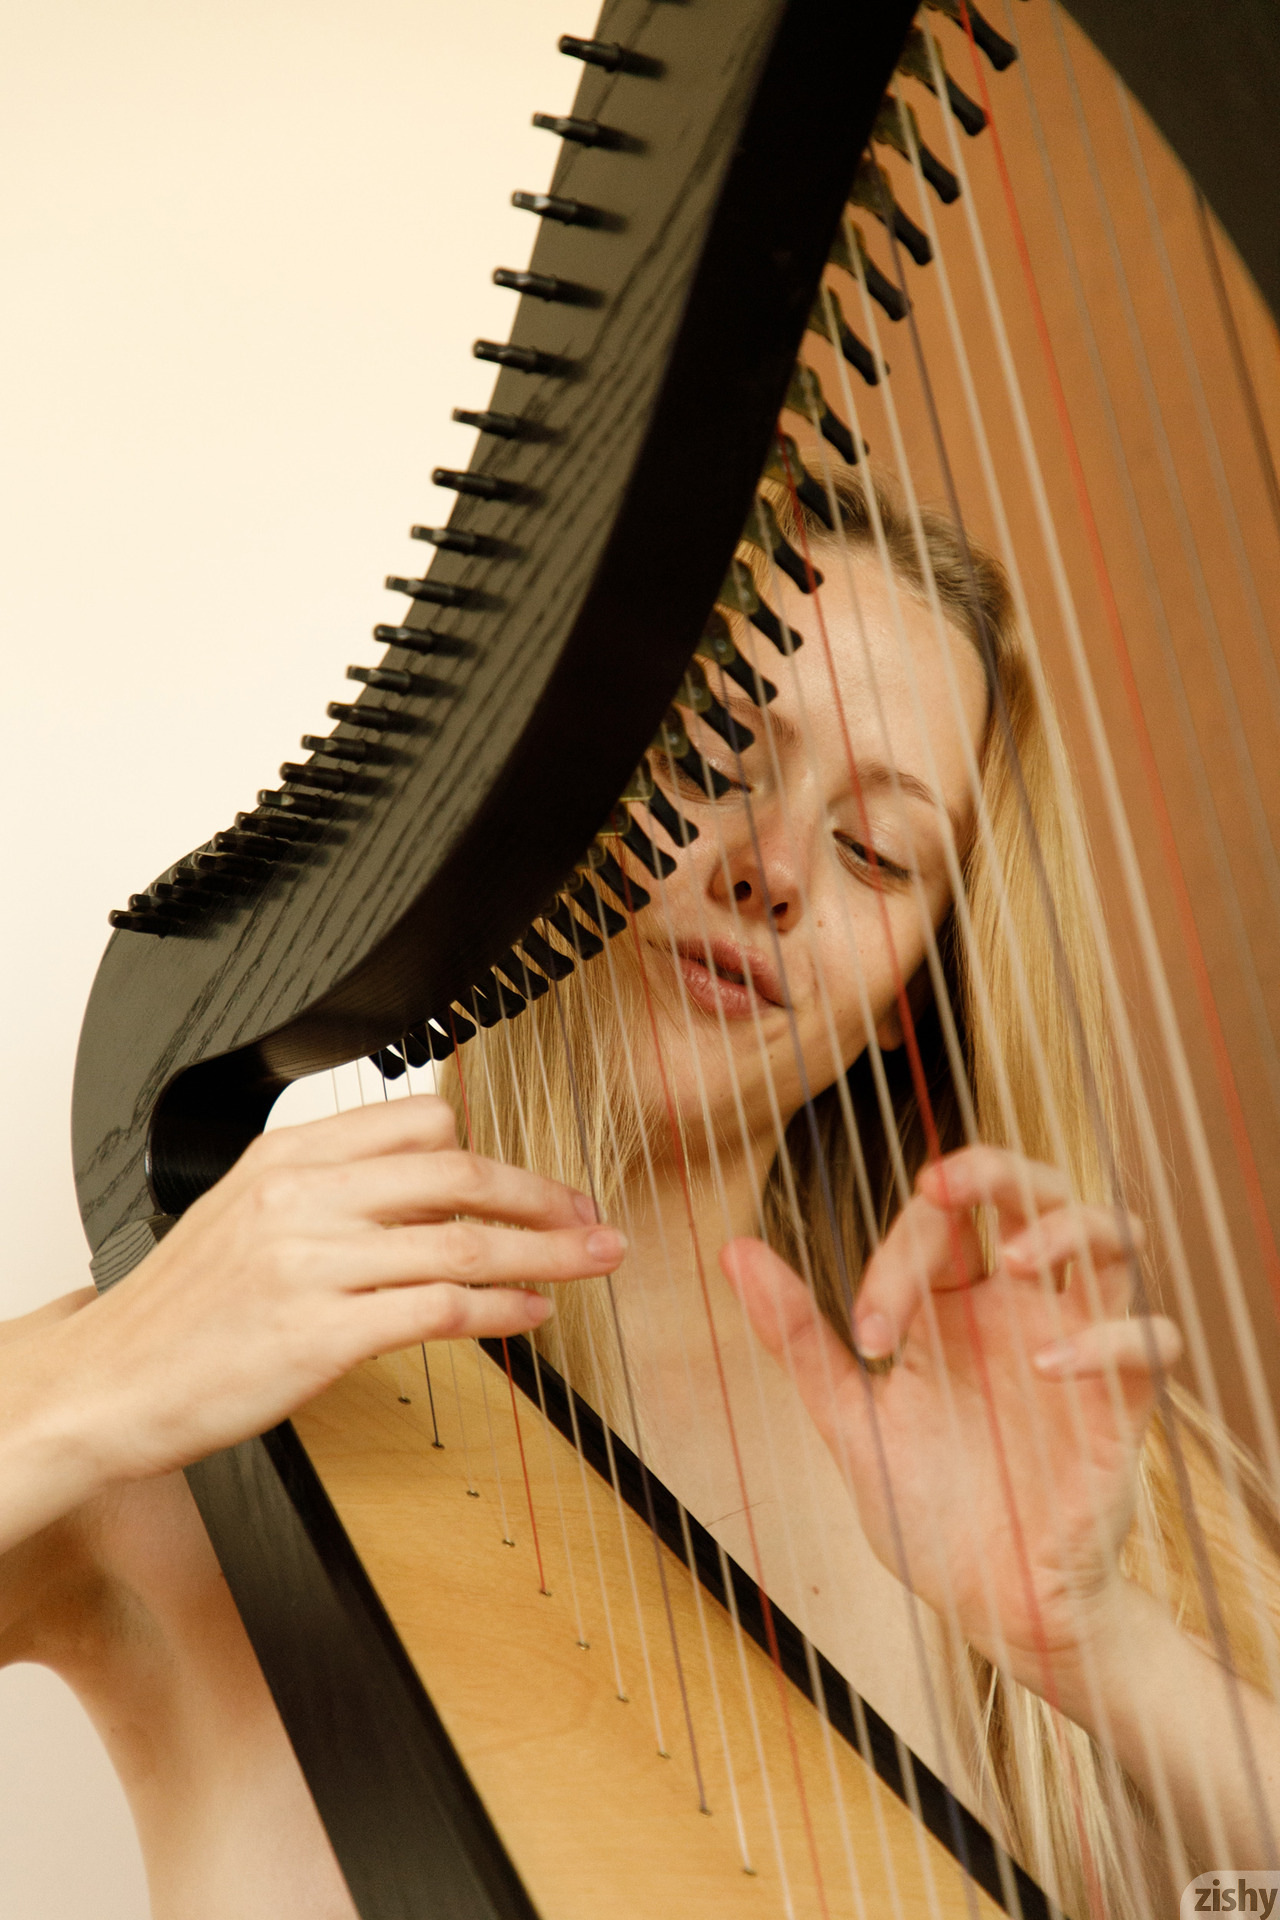 Helen Bergstrom Show Me Your Strings Zishy (22)